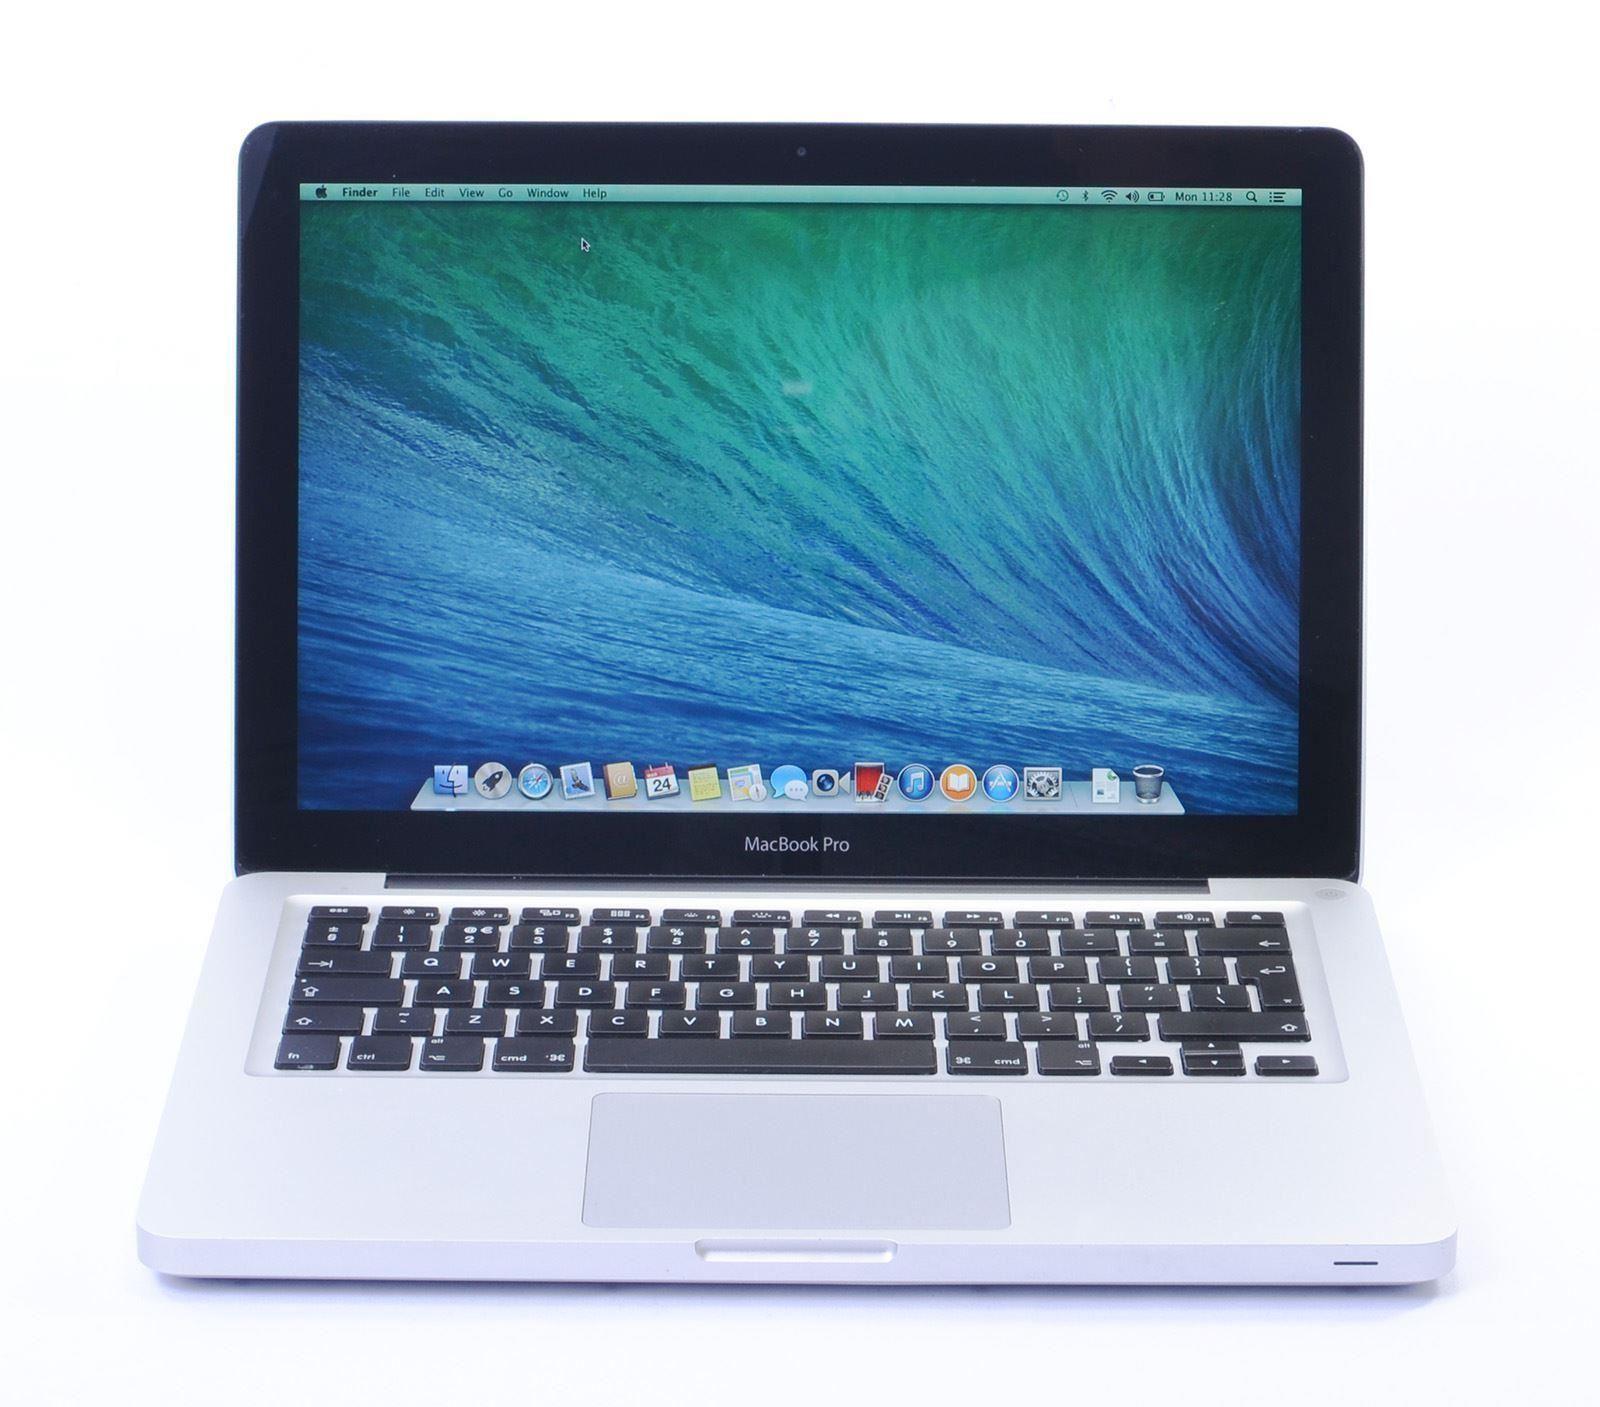 apple macbook pro 13 3 inch intel core i7 2 9 ghz 8 gb 750 gb md102ll a ebay. Black Bedroom Furniture Sets. Home Design Ideas